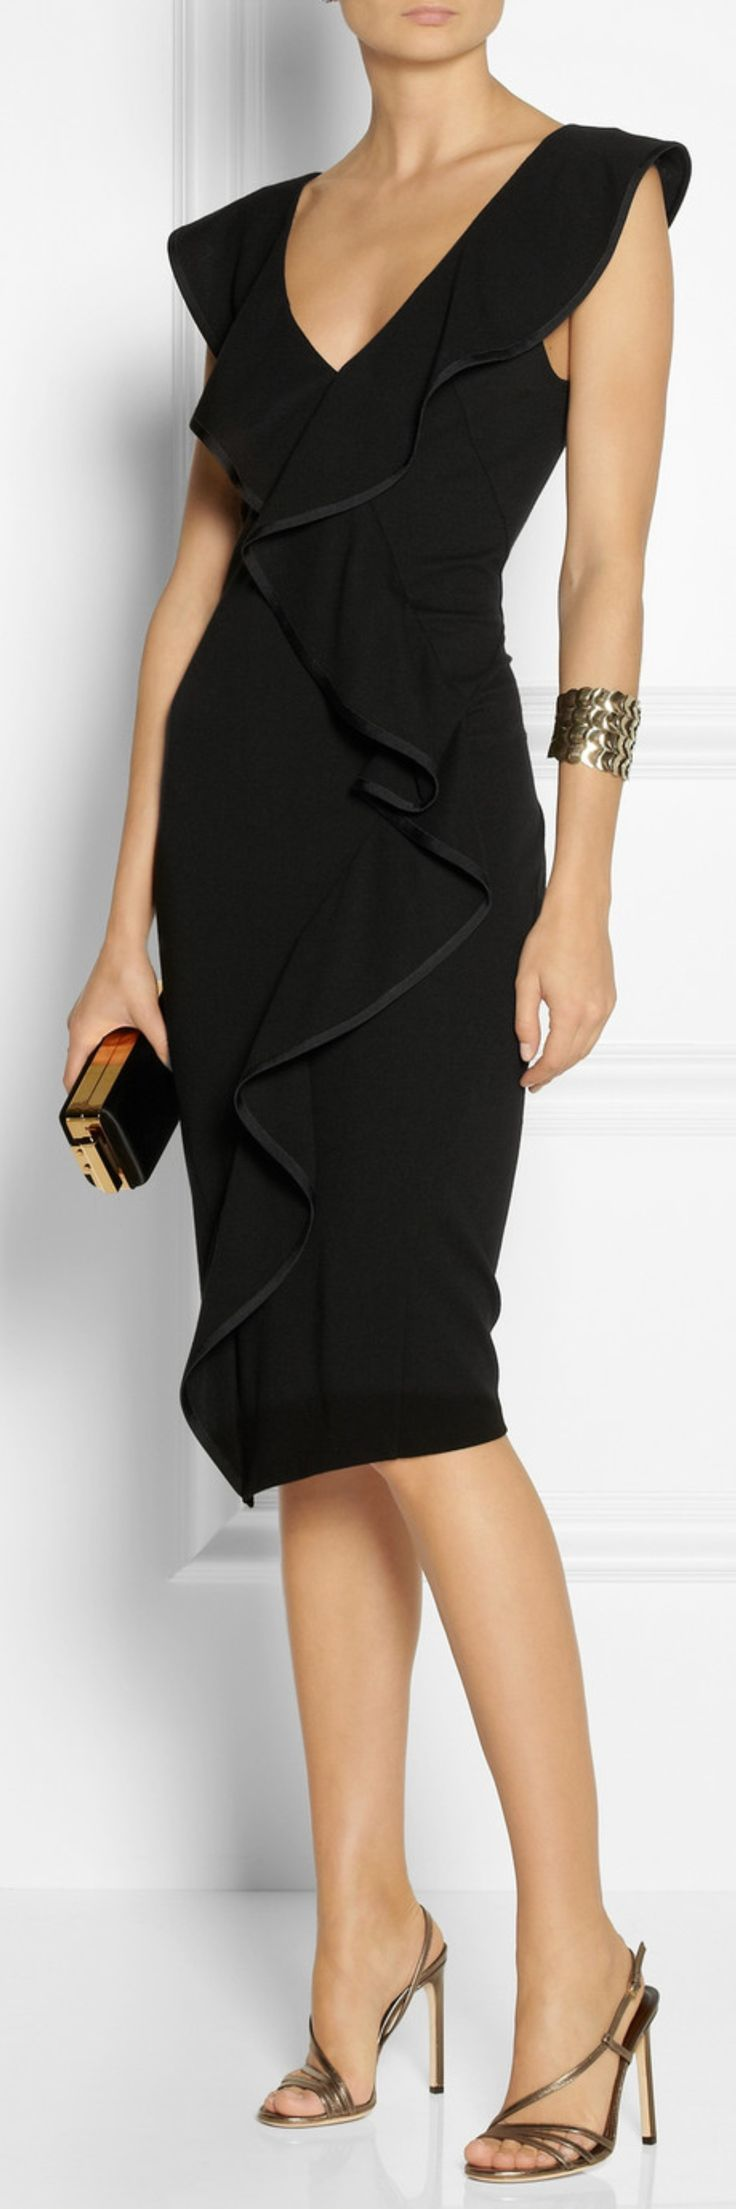 Goodliness fashion dresses luxury designer dress cute